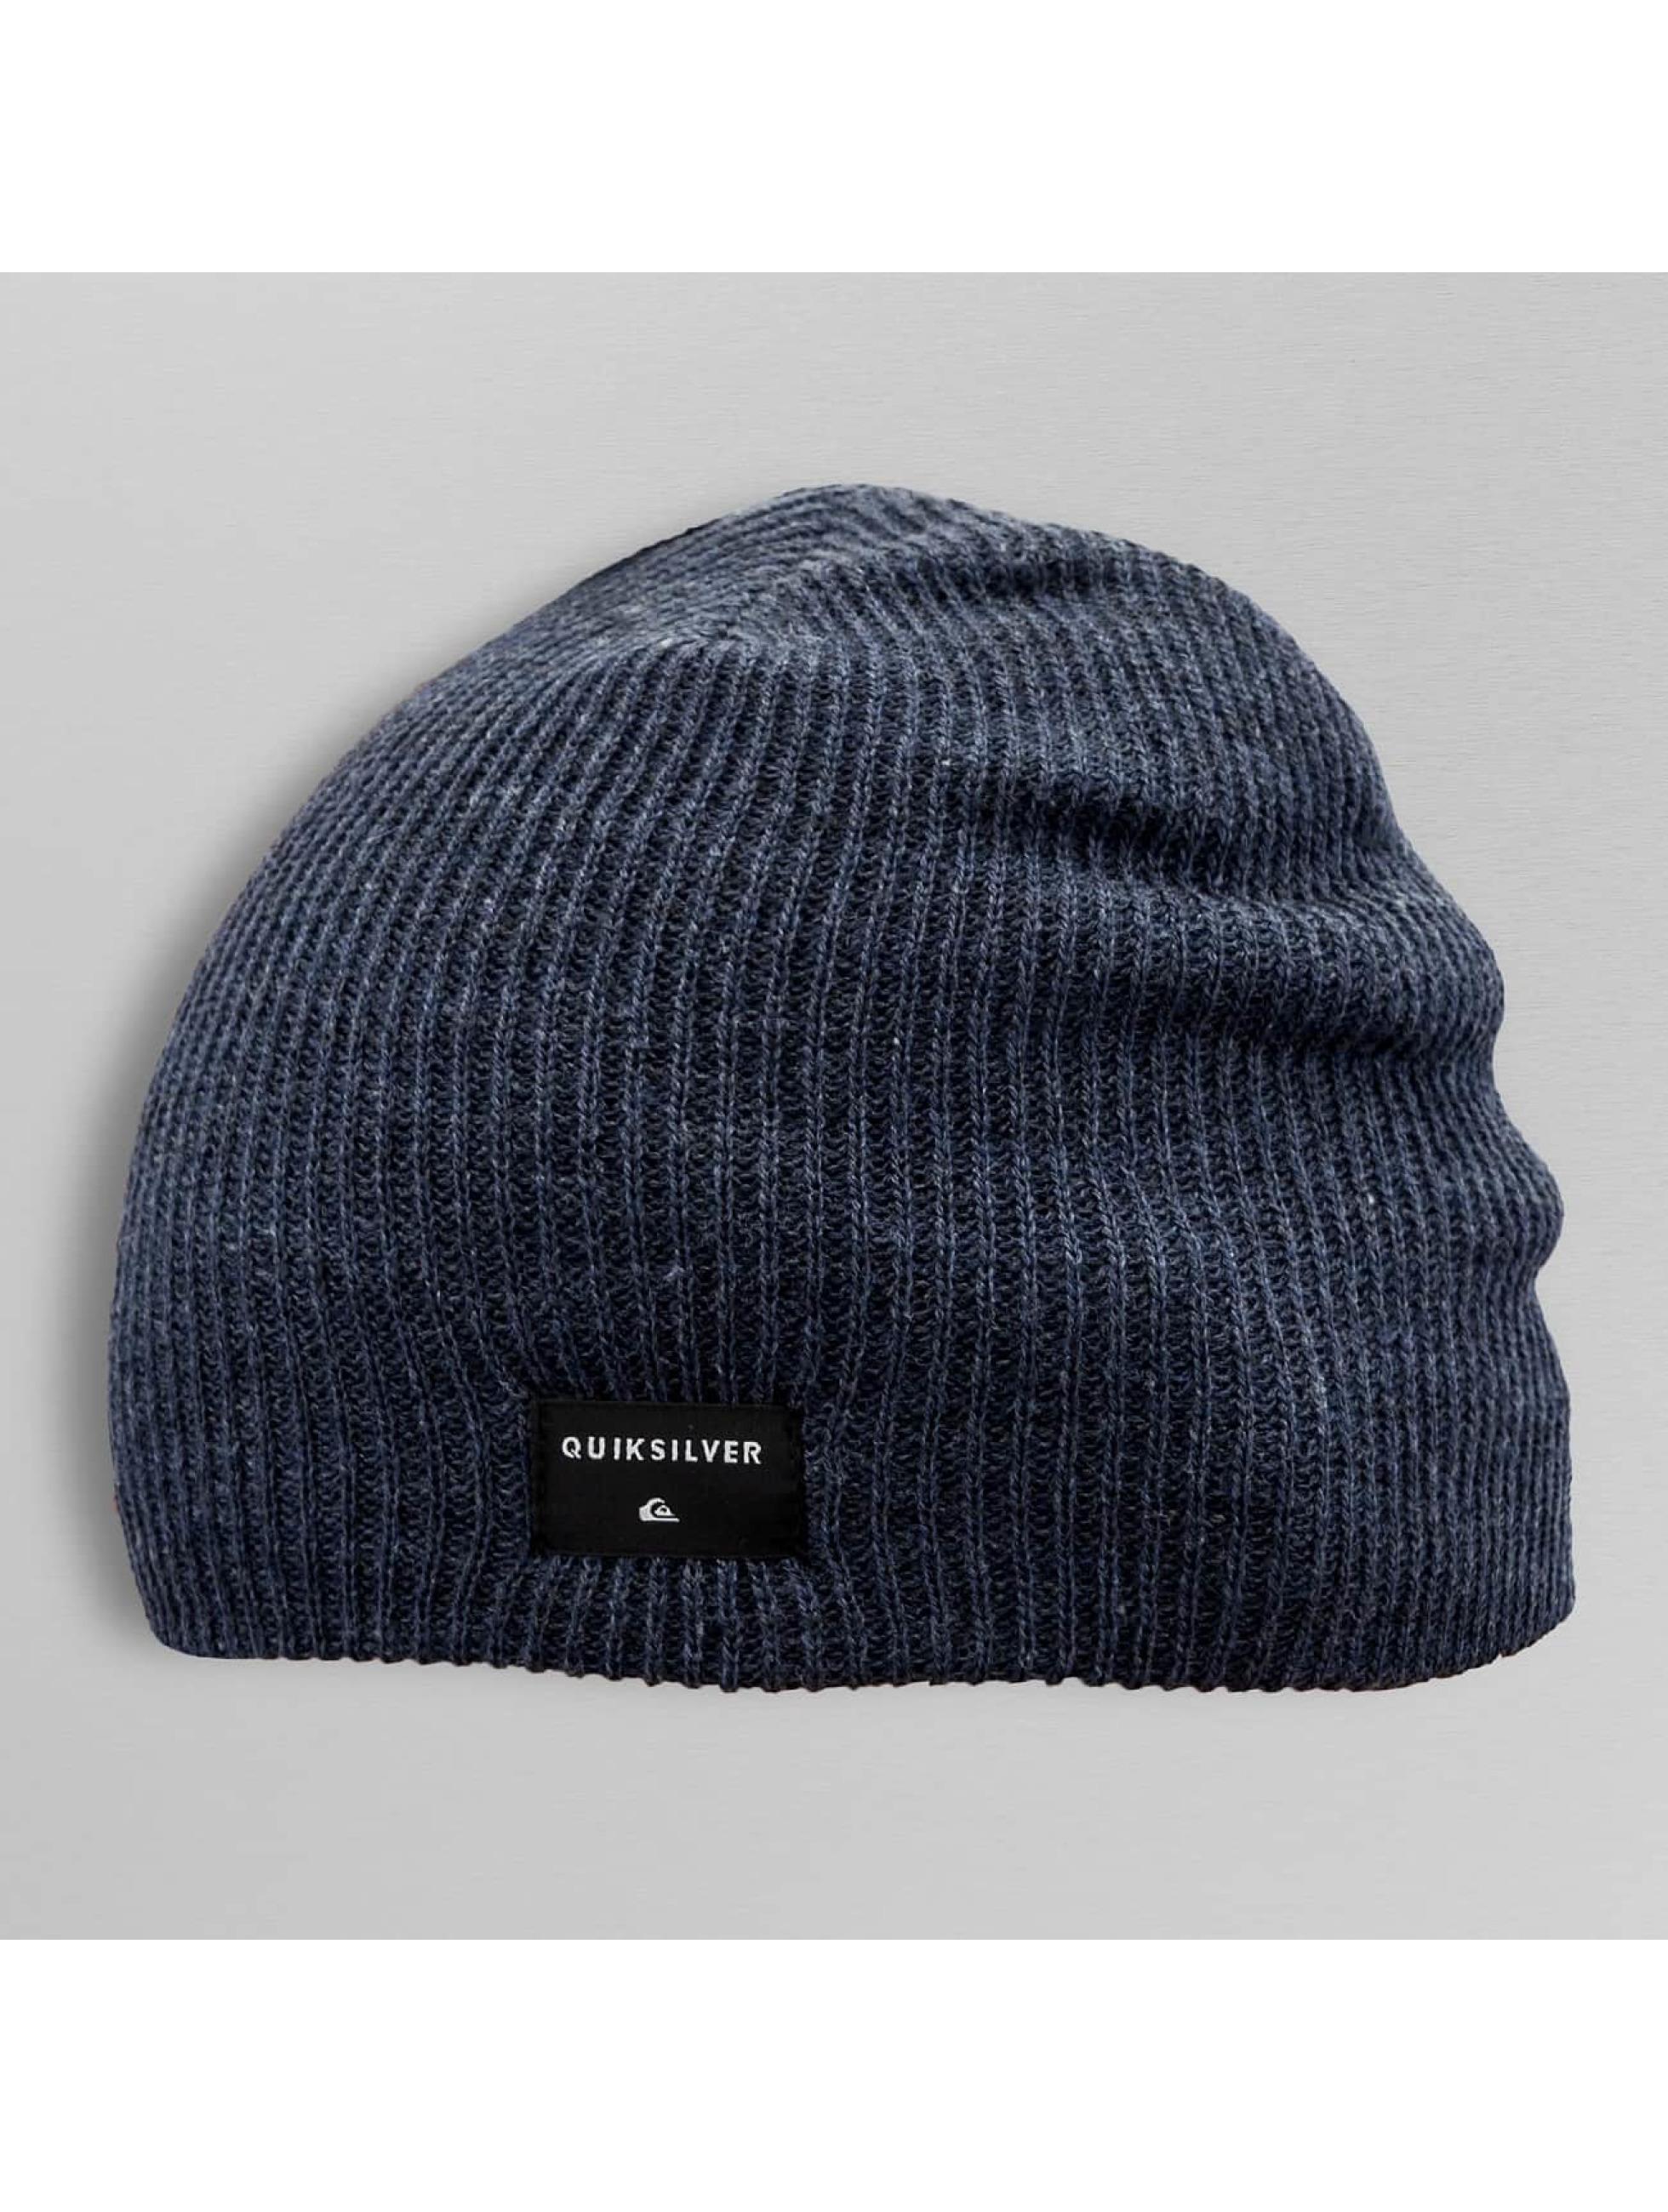 Quiksilver Hat-1 Cushy blue